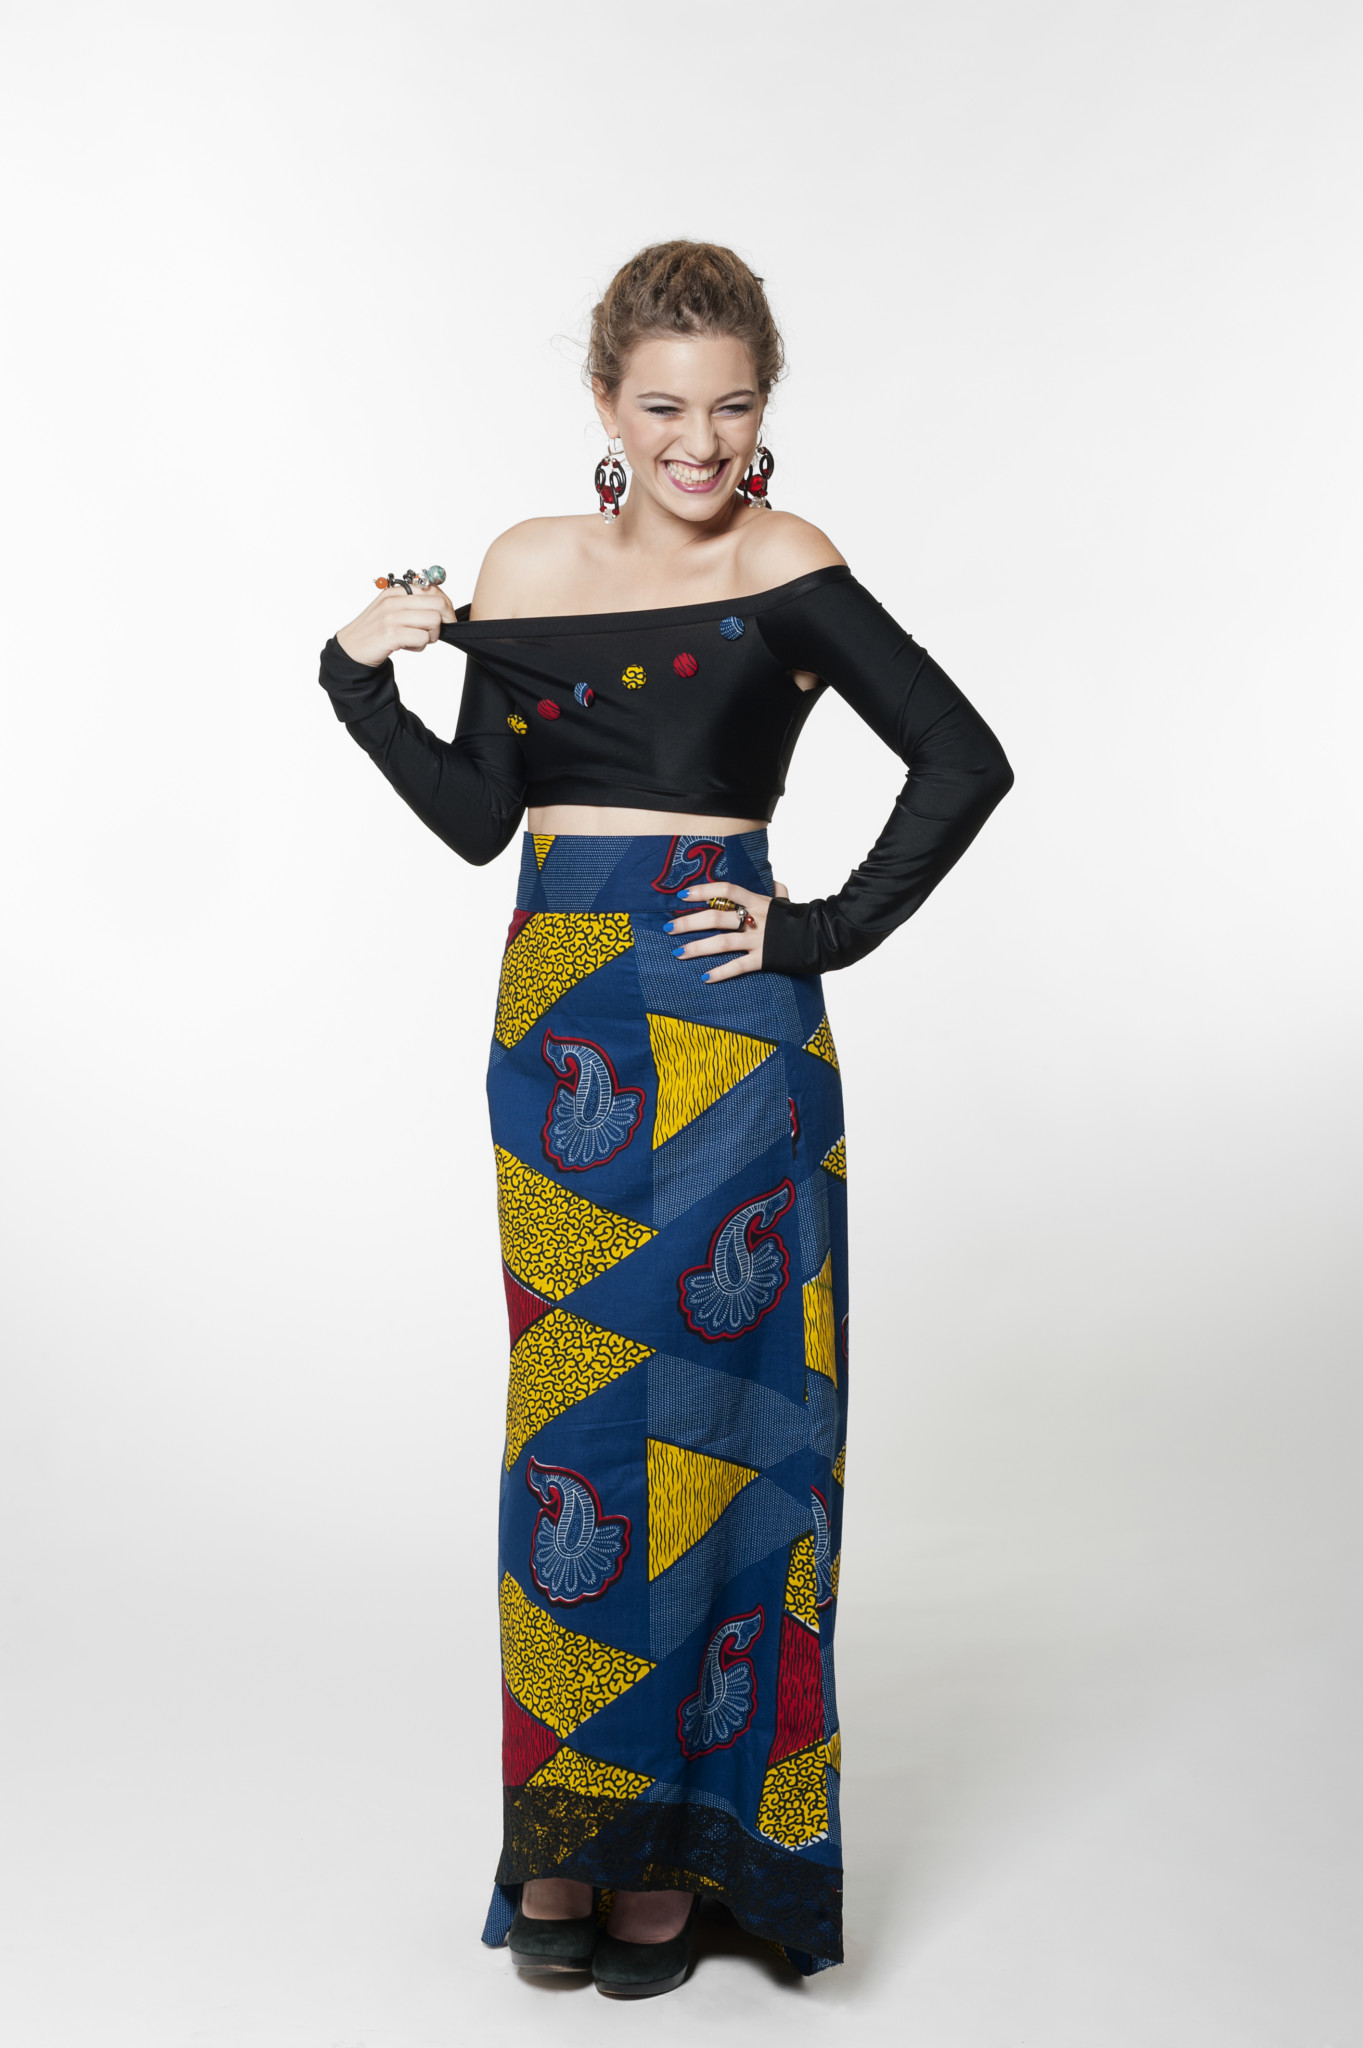 Model Mary Kaye